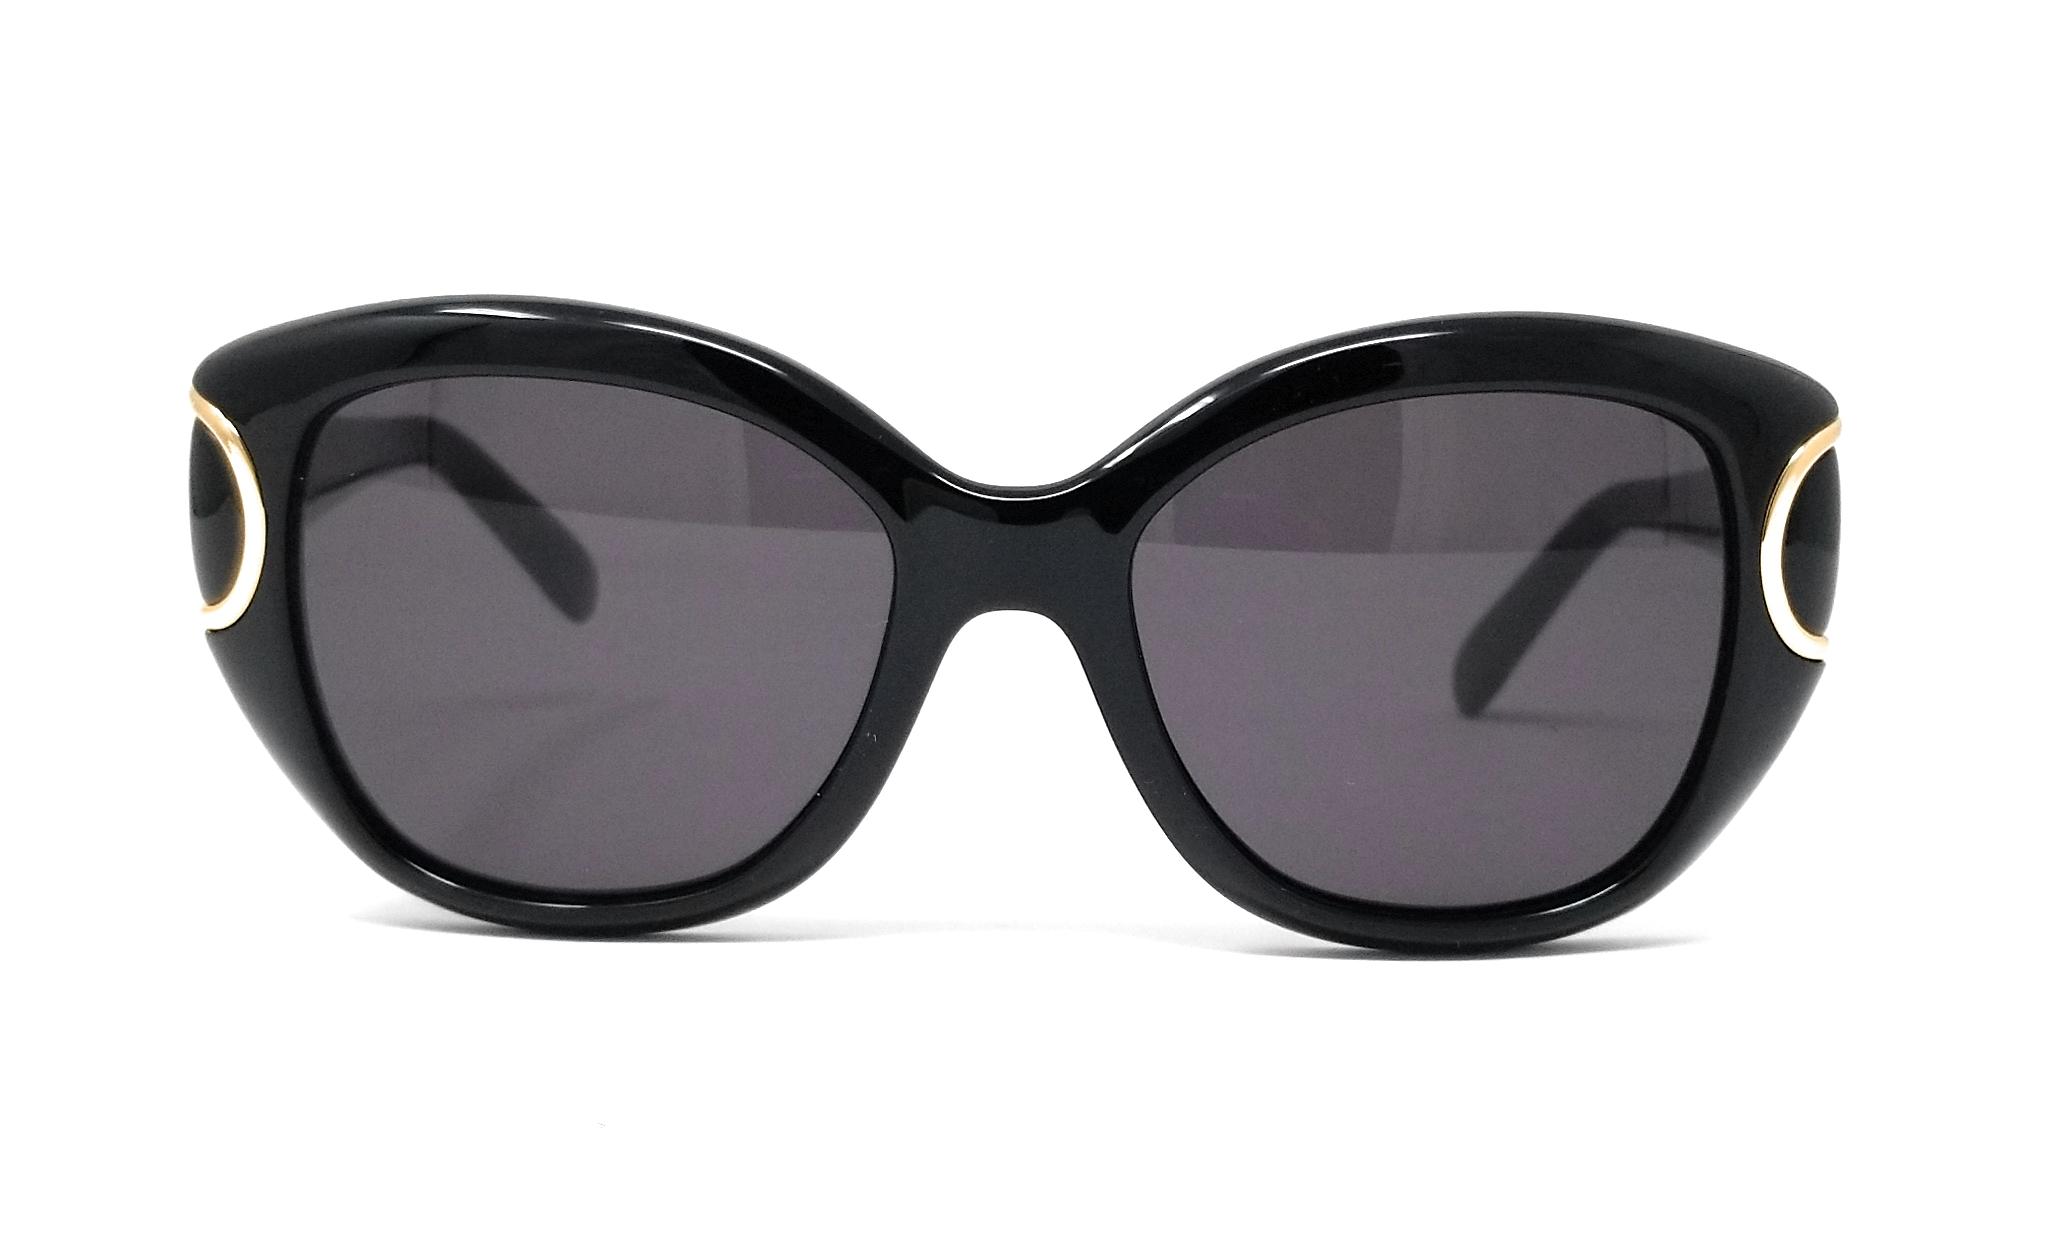 c04b7a4b5b Salvatore Ferragamo Sunglasses SF819S 001 Black Rectangle 54x18x140 ...